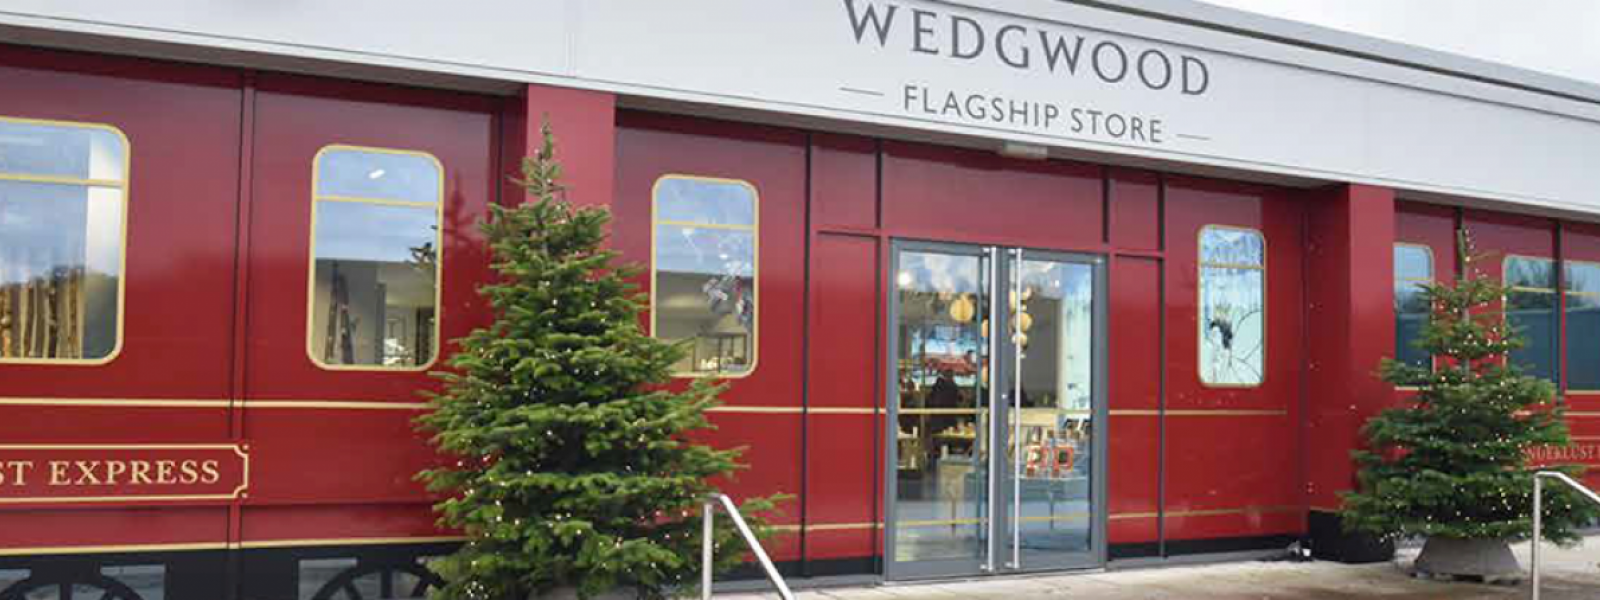 sg_wedgewood